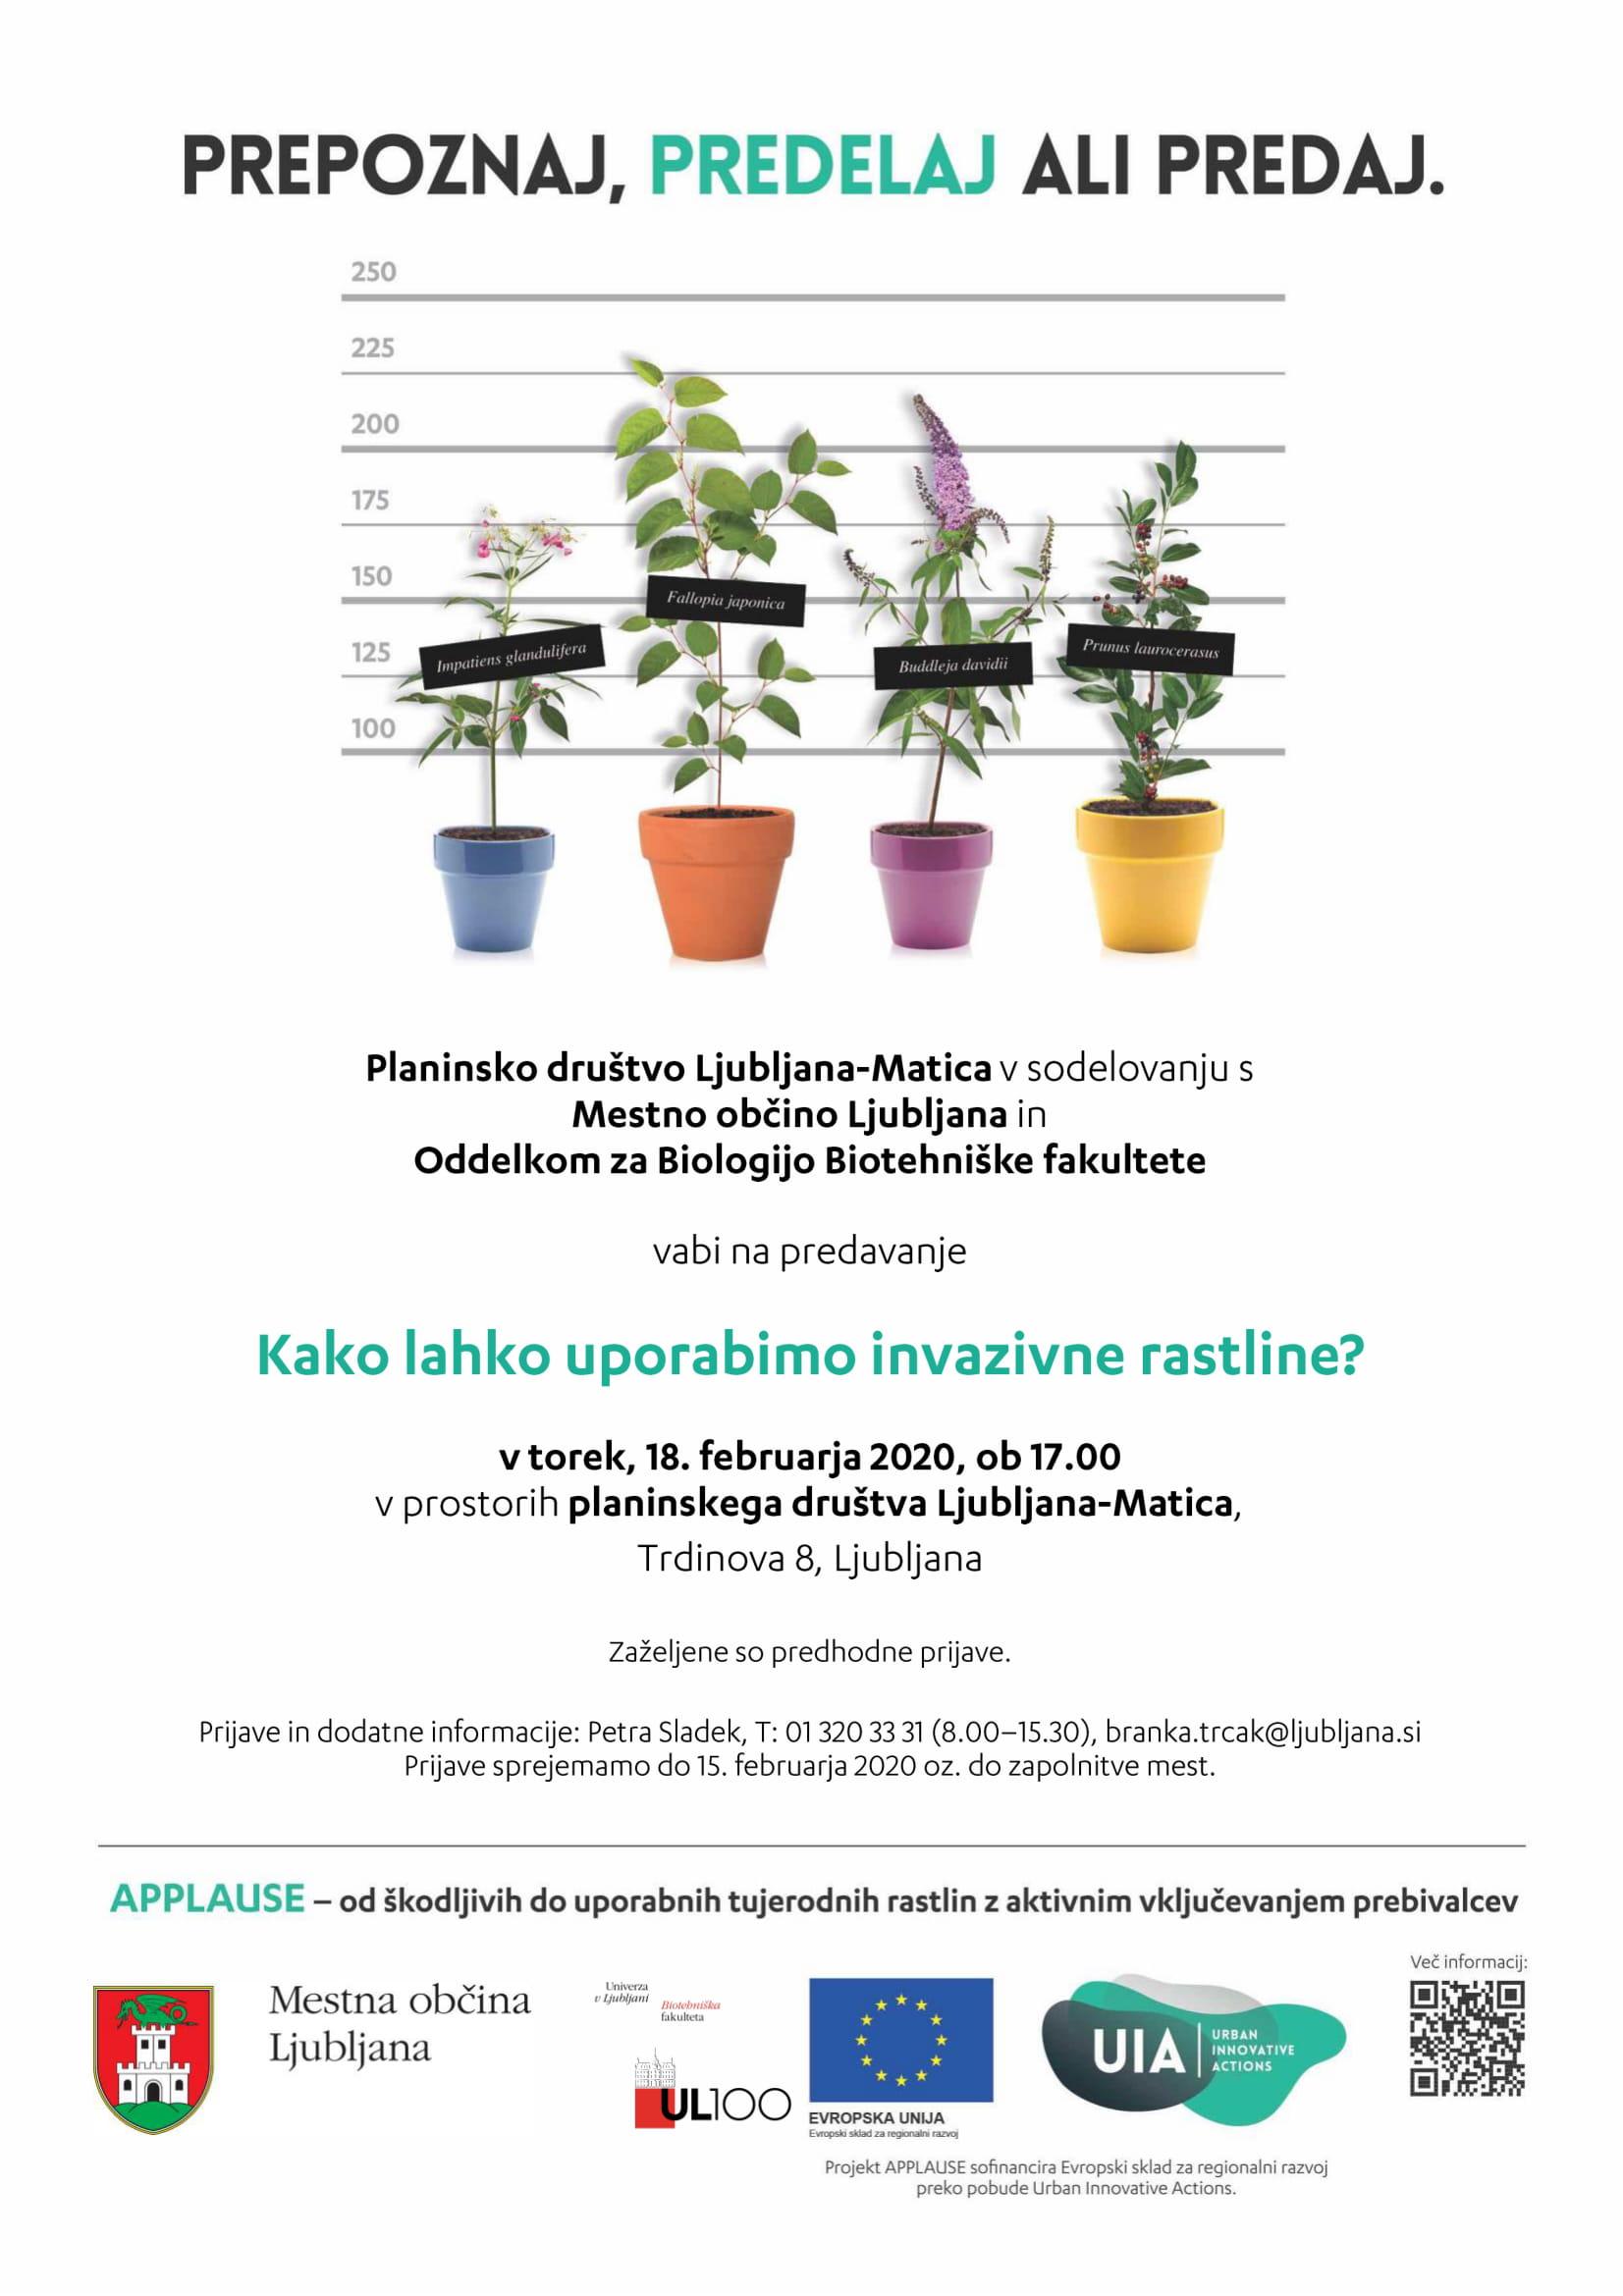 MOL_tujerodne_rastline_vabilo_word_belo_logotipi_mu_terPD_LjMatica_1